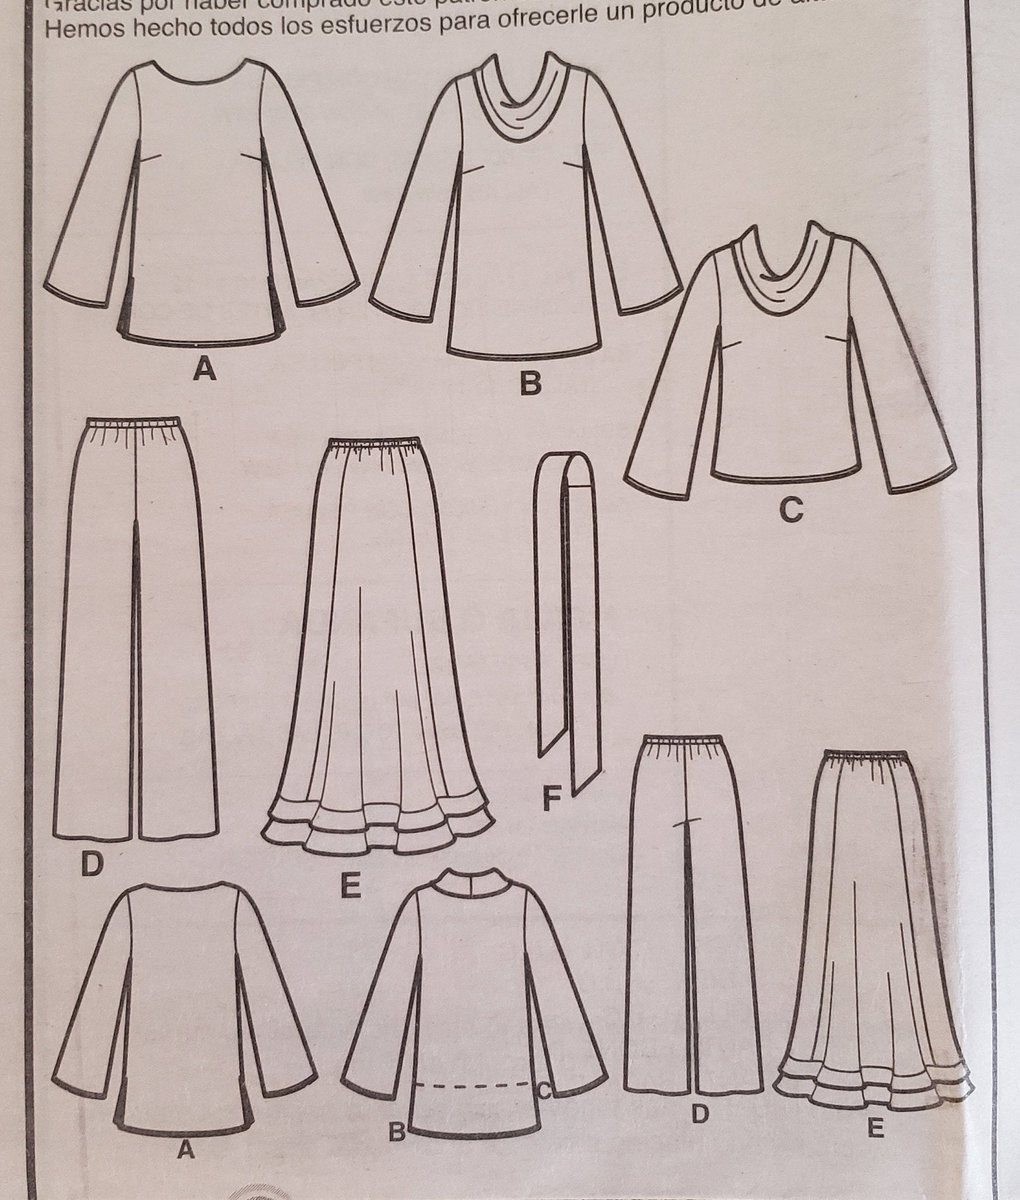 Skirt Pants Sash Scarf   Sewing Pattern Simplicity 3568 Women/'s//Misses/' Top